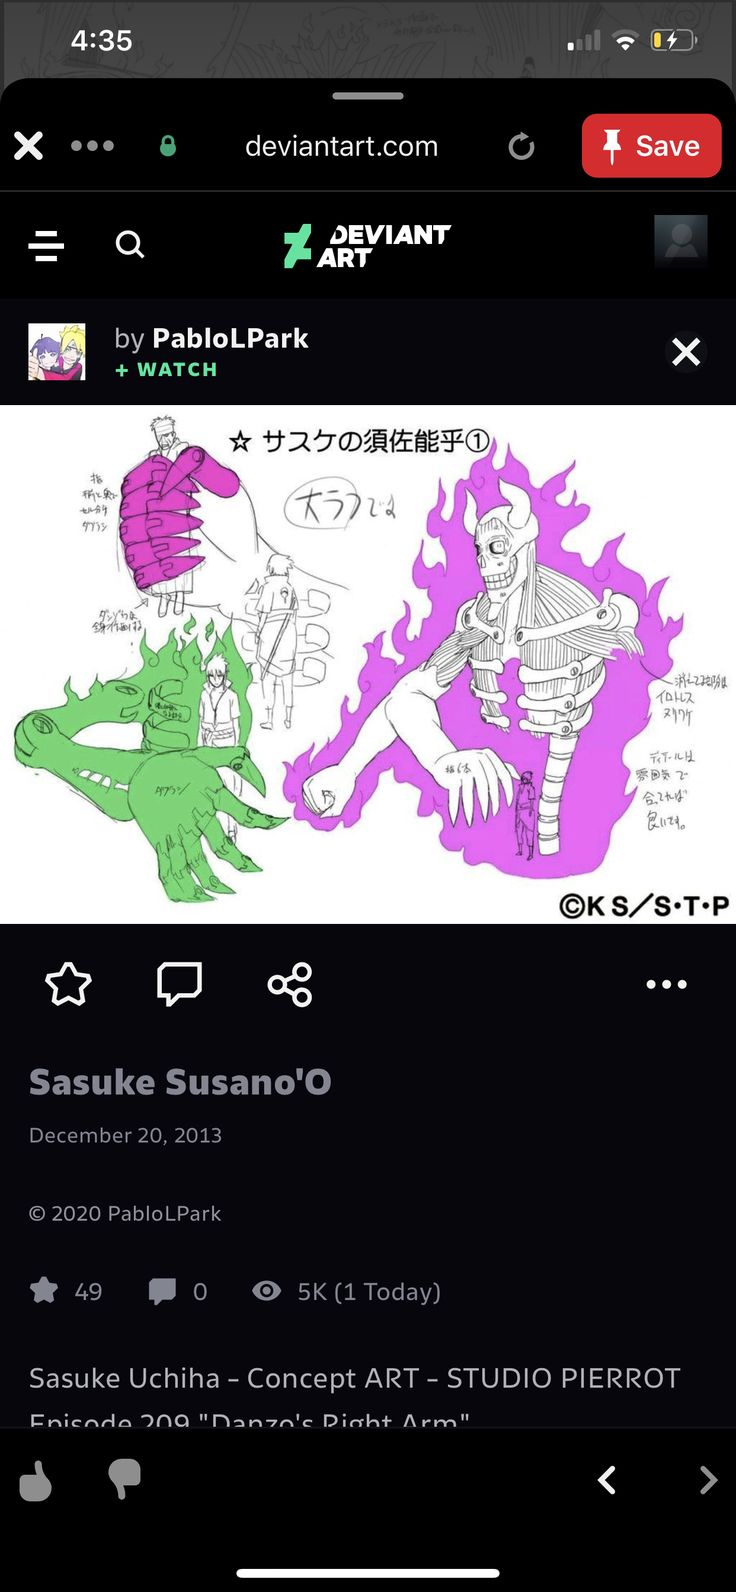 Pin by LuisPeso on Naruto in 2020 Concept art, Uchiha